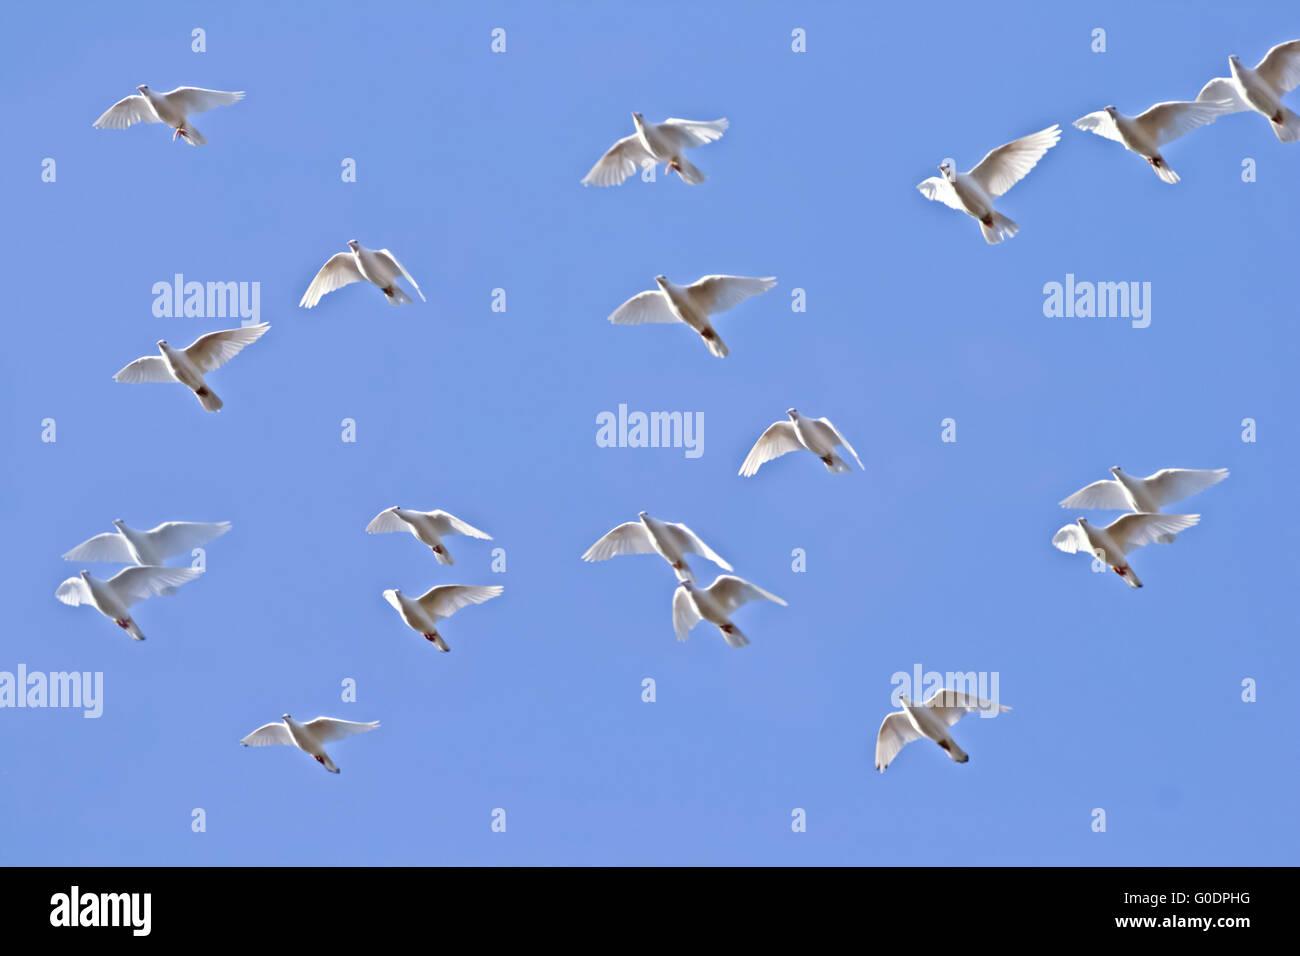 Palomas Blancas Volando Foto Imagen De Stock 103565324 Alamy